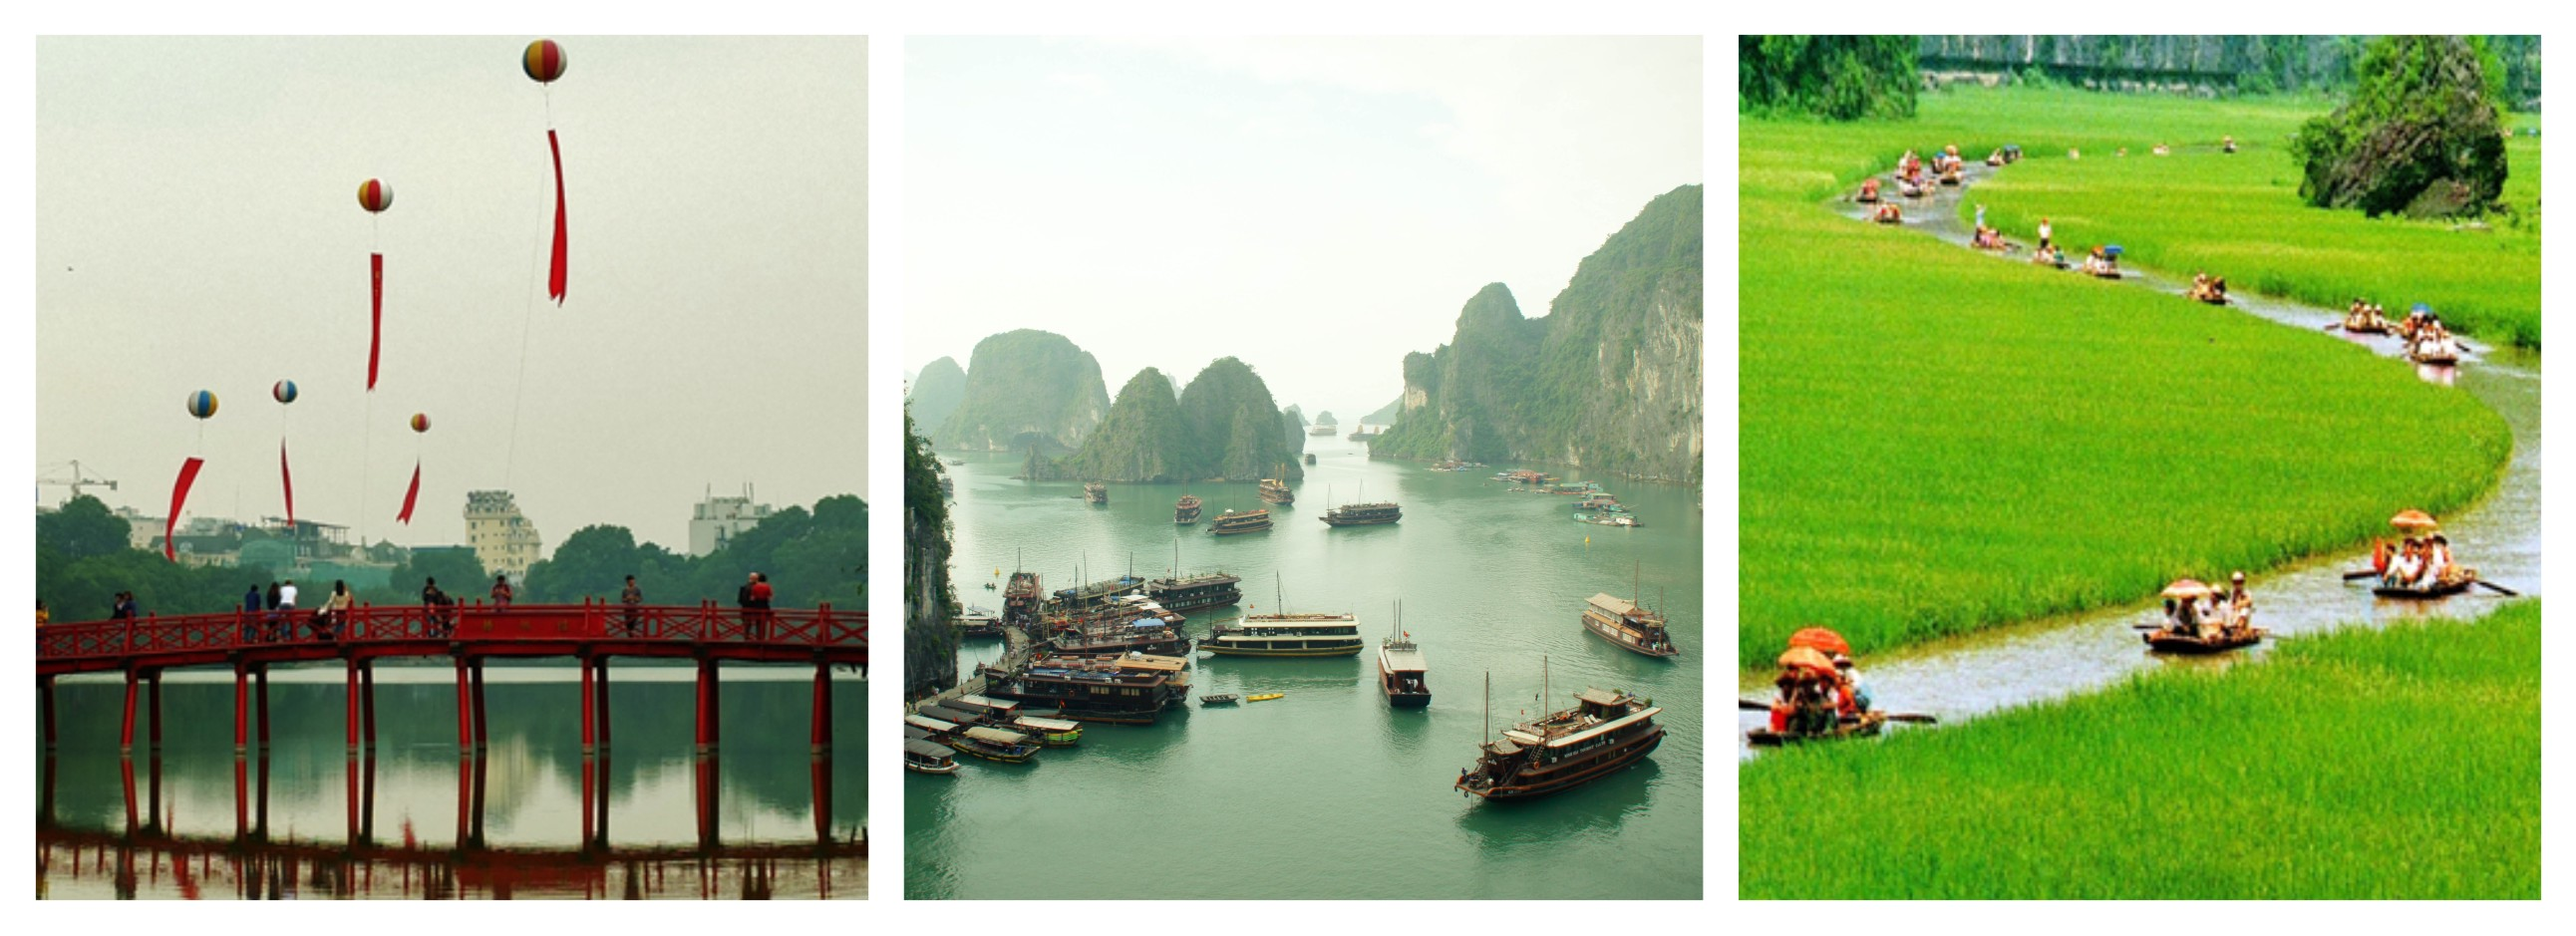 Hanoi - Halong Bay - Tamcoc